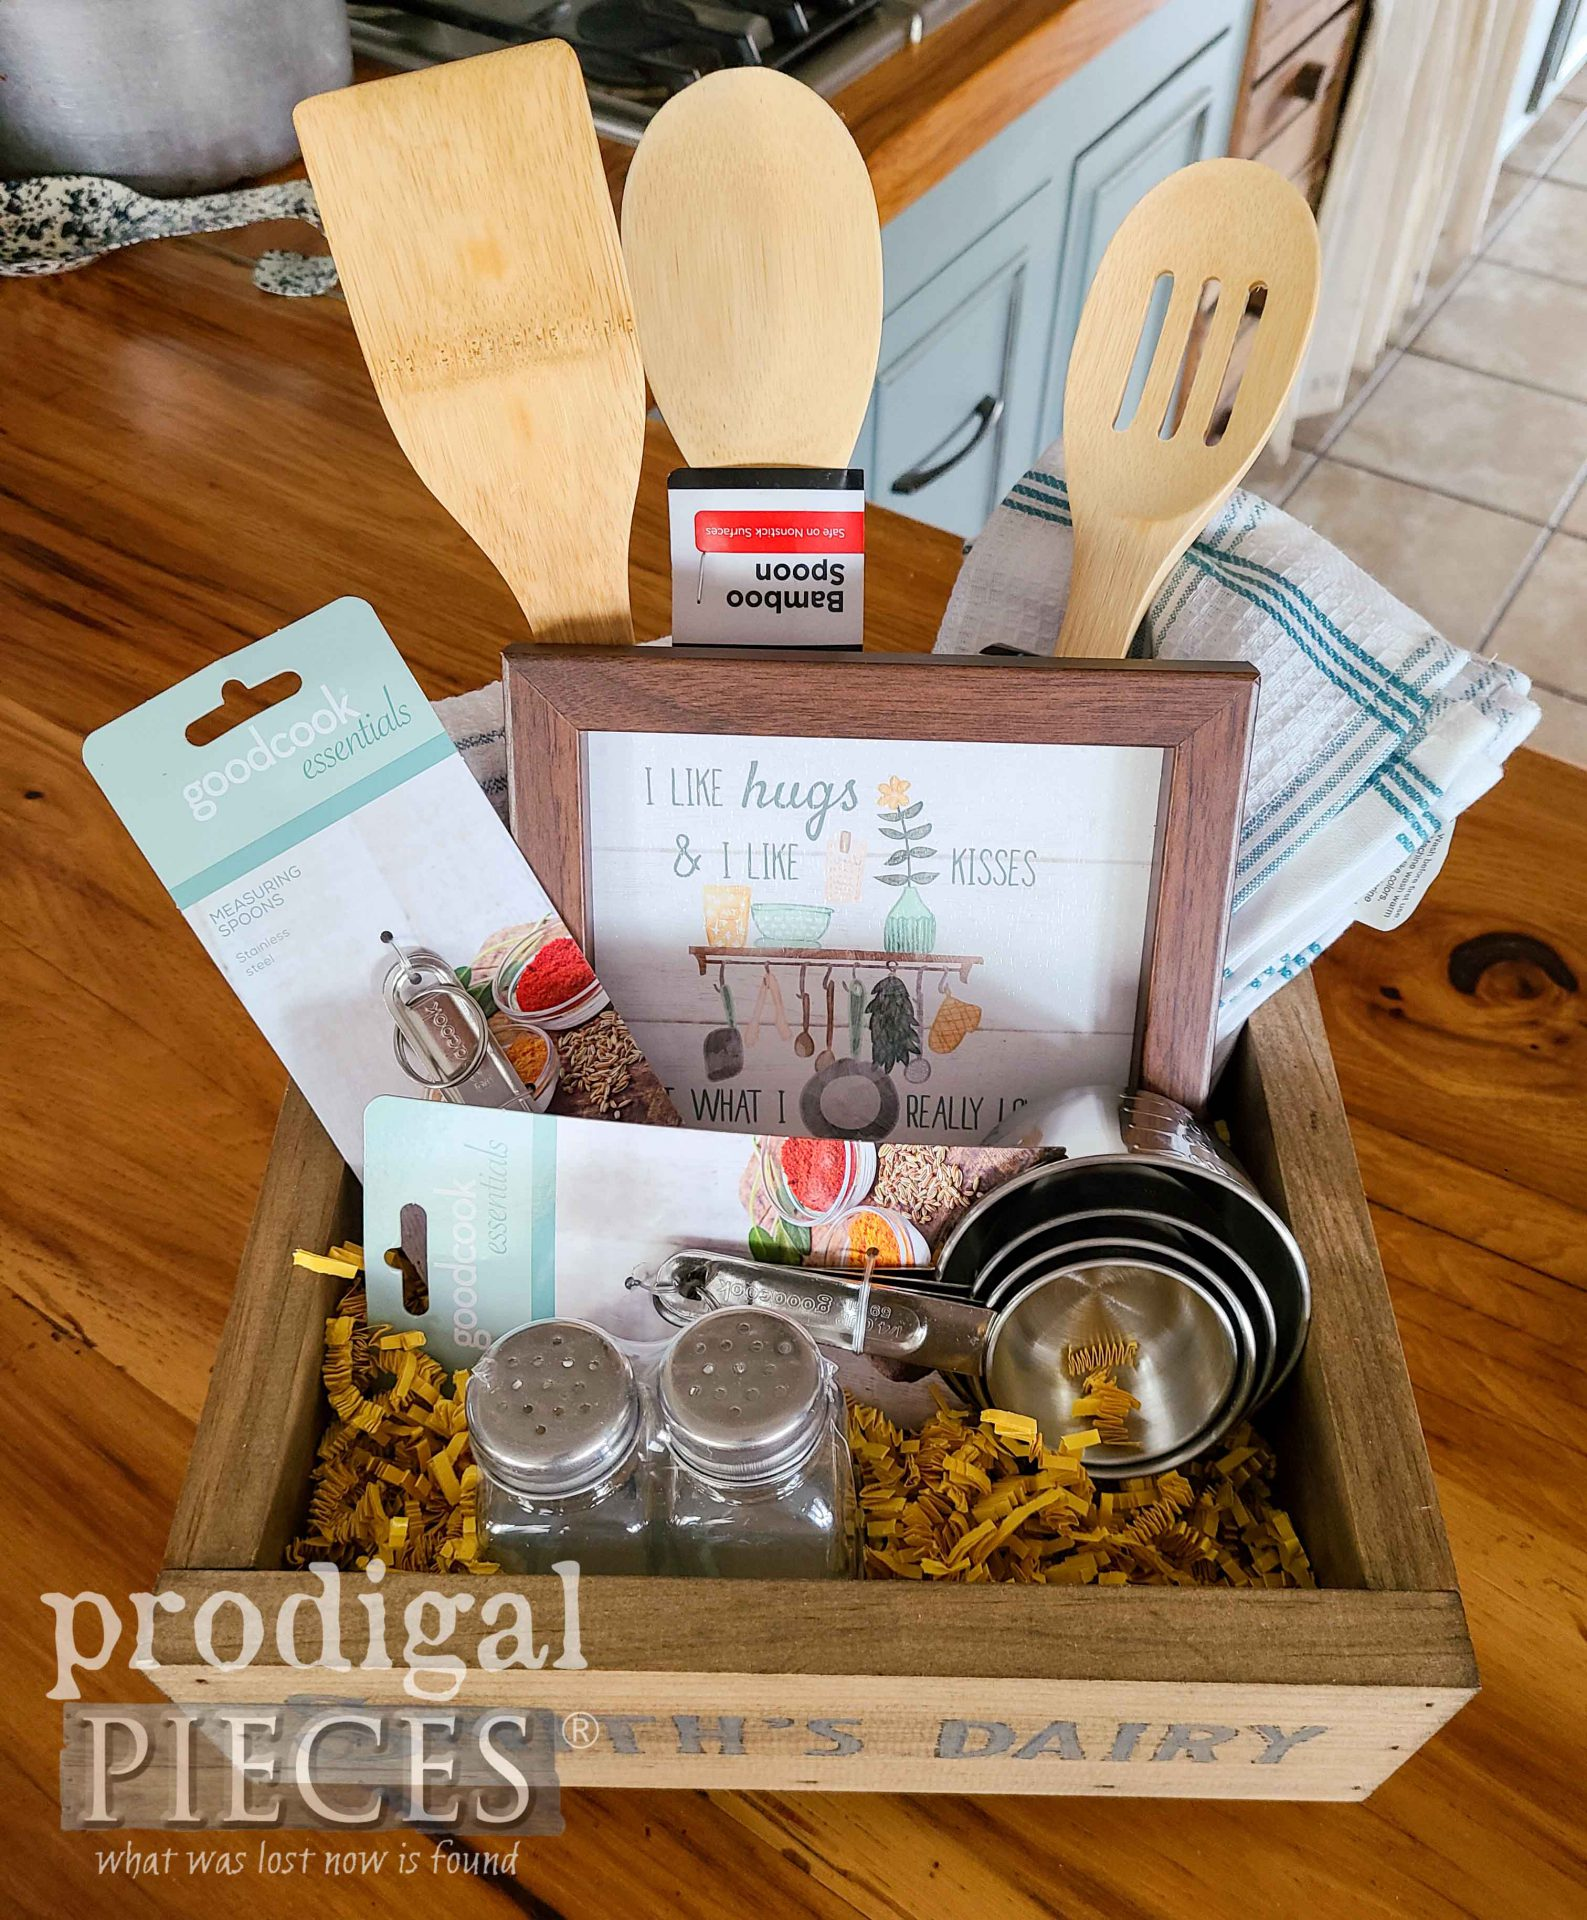 Assembled Kitchen Gift Box by Larissa of Prodigal Pieces | prodigalpieces.com #prodigalpieces #farmhouse #kitchen #diy #home #homedecor